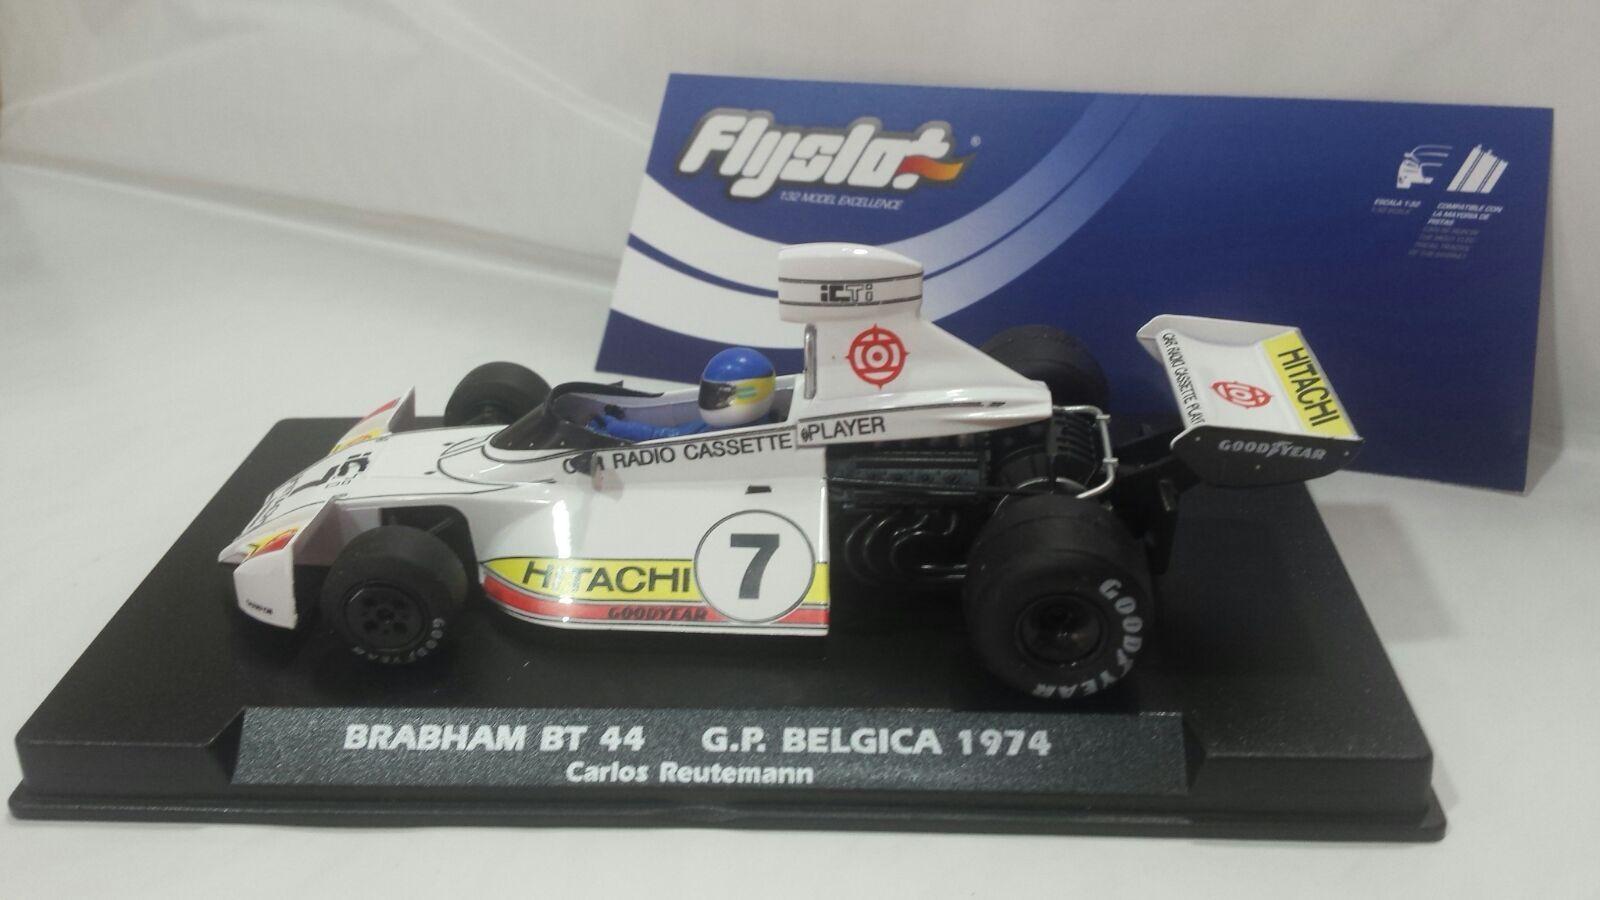 Flyslot brabham bt44 gp belgica 1974 - carlos reuteman - neu